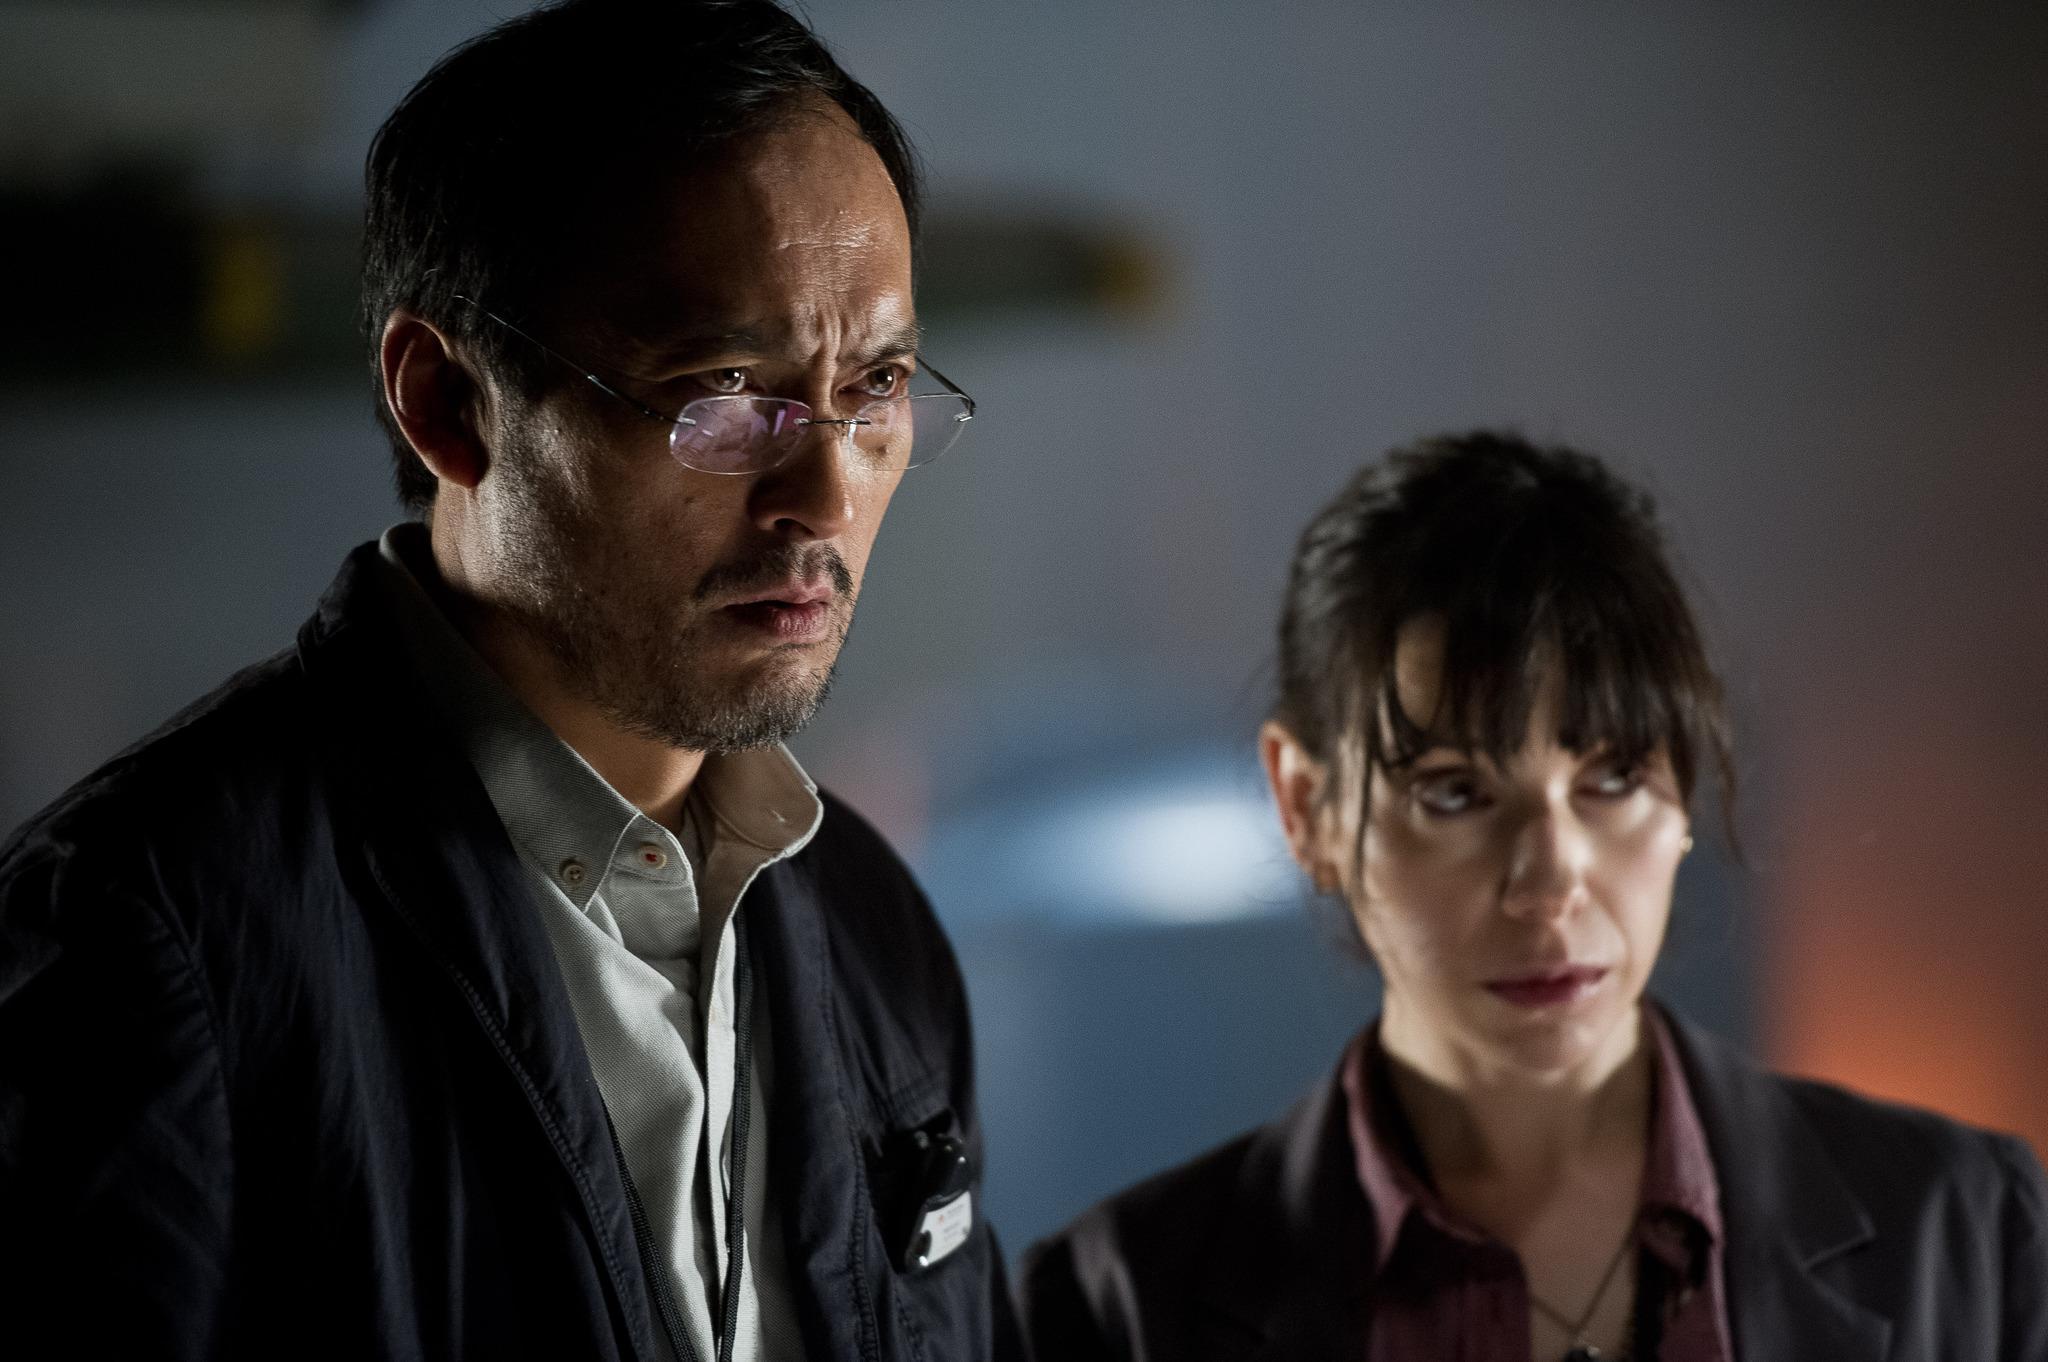 Ken Watanabe as Dr. Serizawa and Sally Hawkins as Vivienne Graham